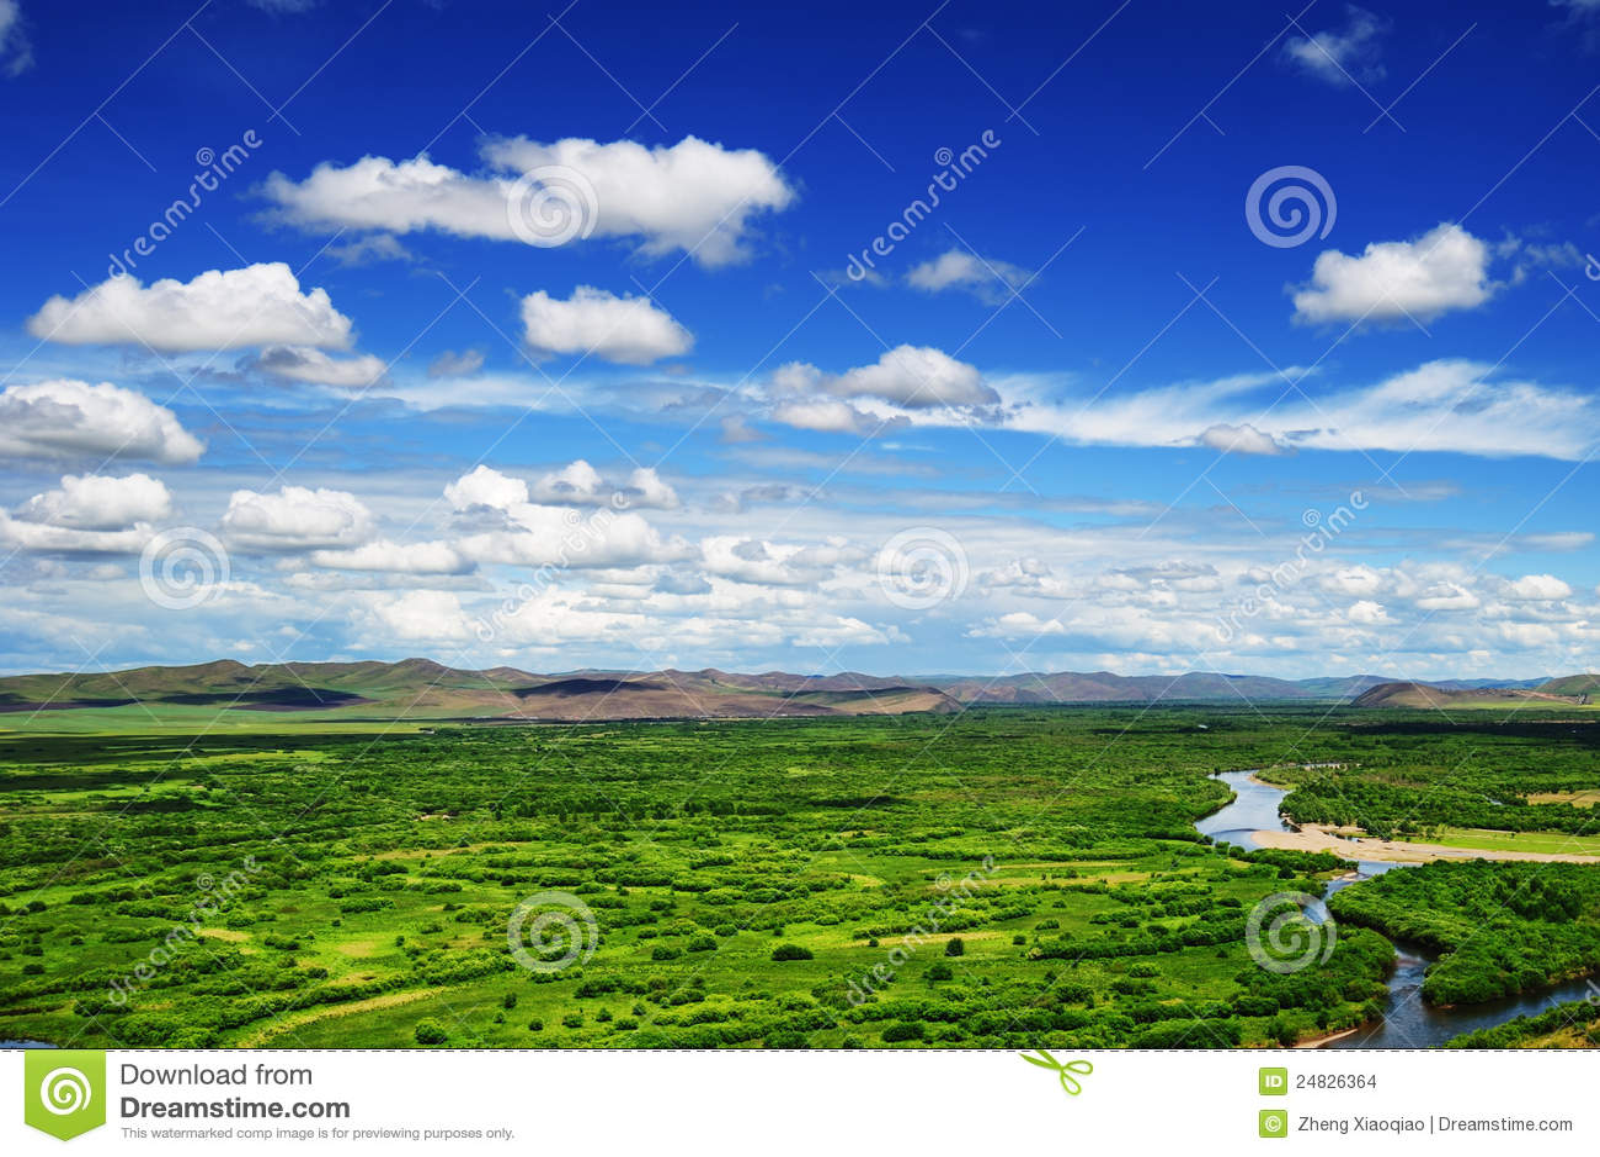 GEN-Feuchtgebiet, Mongolei-Provinz, China